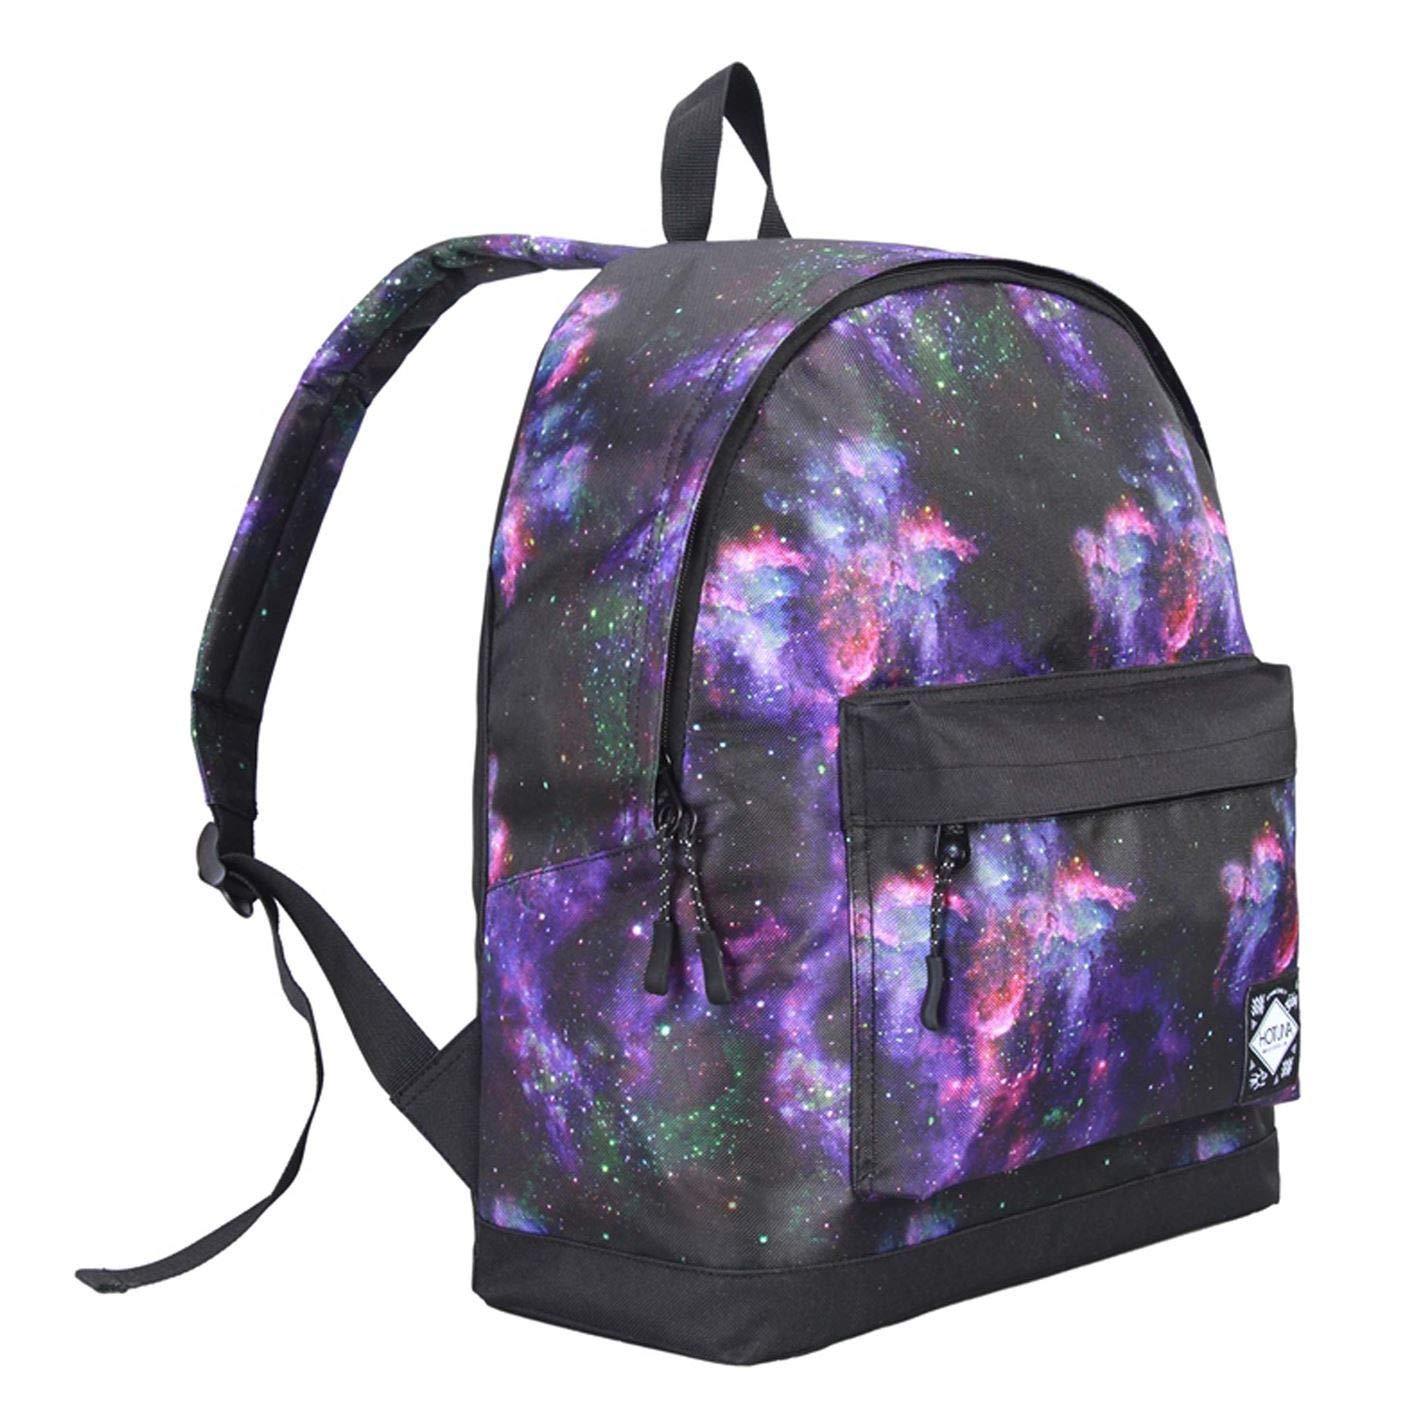 Galaxy  Purple Hot Tuna Galaxy Backpacks Rucksack Backpack Bag Daypack H 40 x W 28 x D 12 (cm) Galaxy  orange